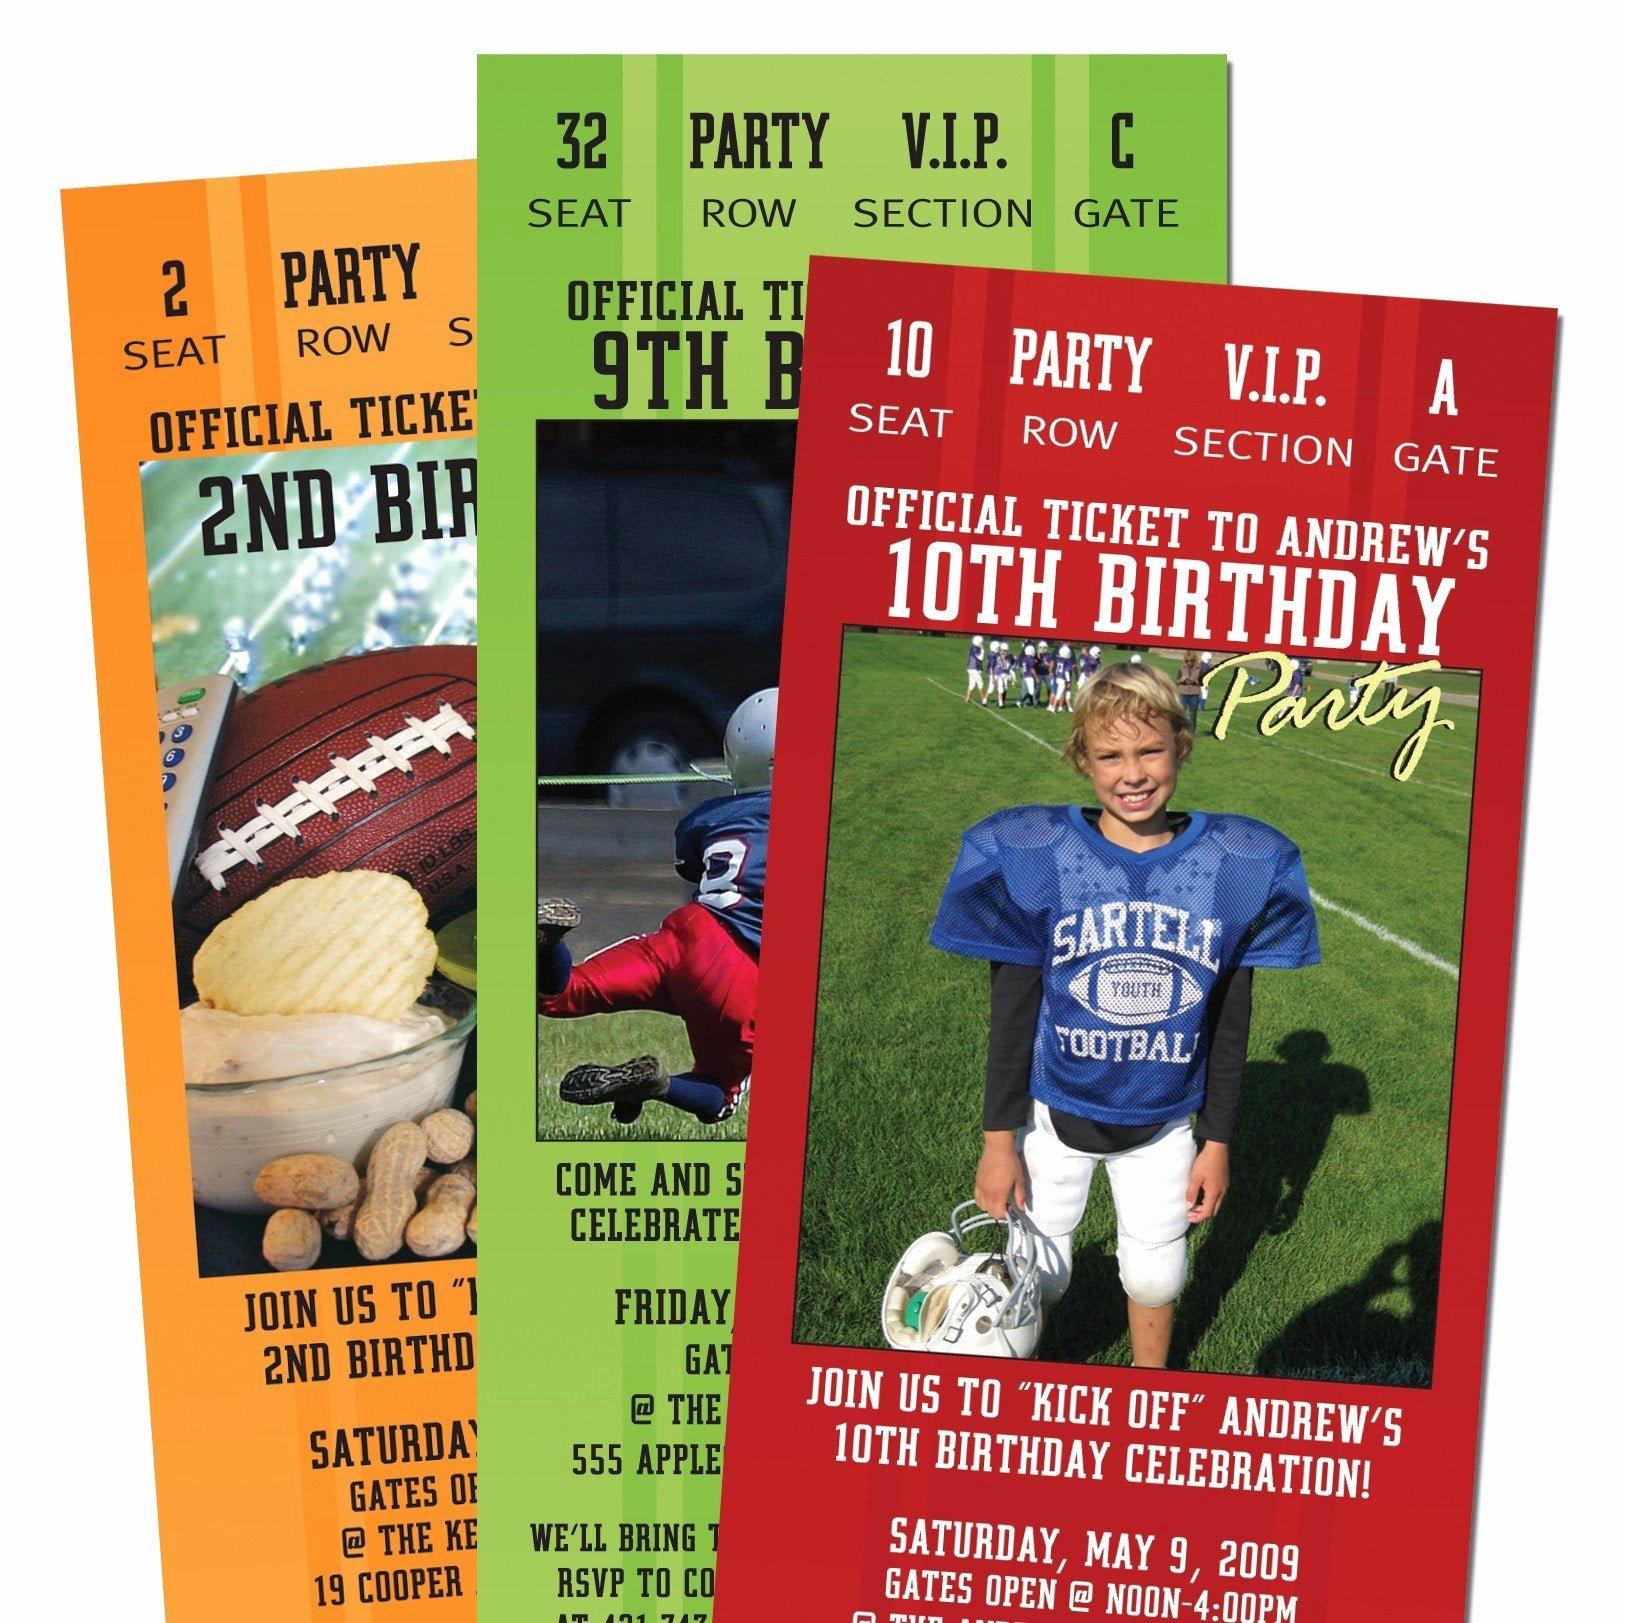 Football Ticket Birthday Invitations New 15 Football Ticket Party Invitations for Adult or